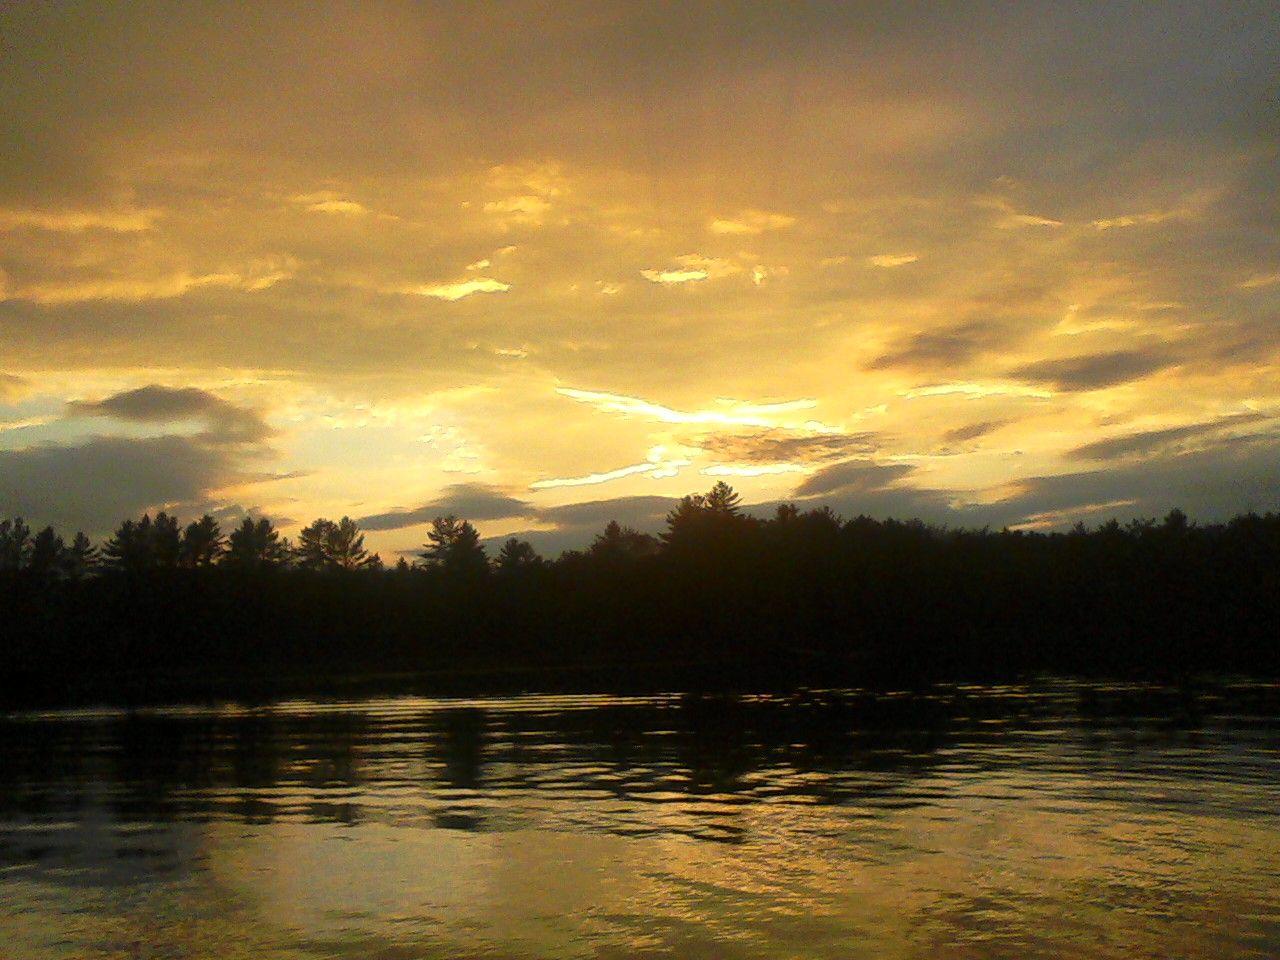 Kezar lake lovell maine maine vermont favorite places